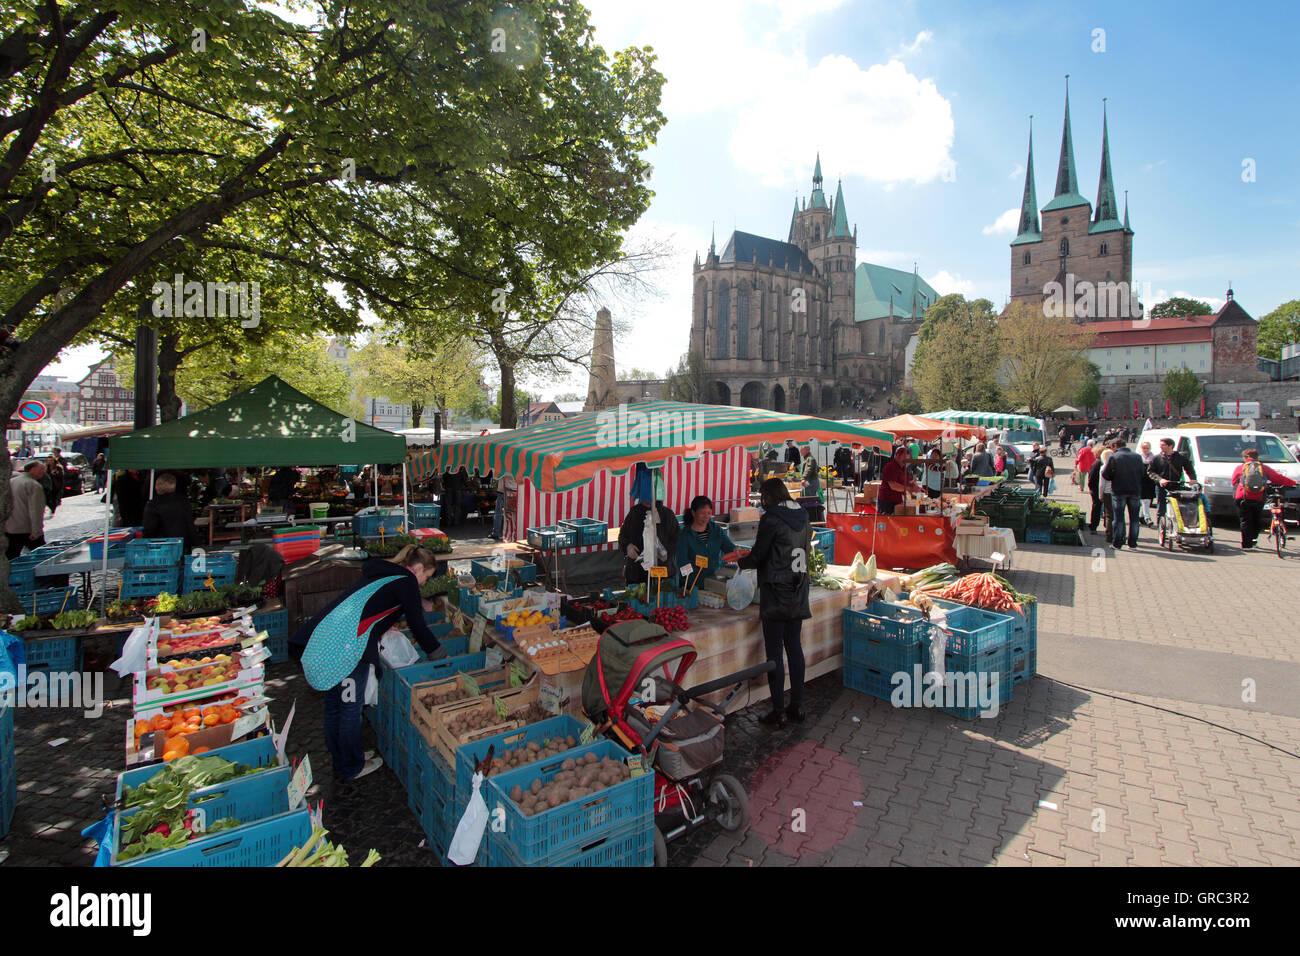 Markt am Domplatz In Erfurt Stockbild